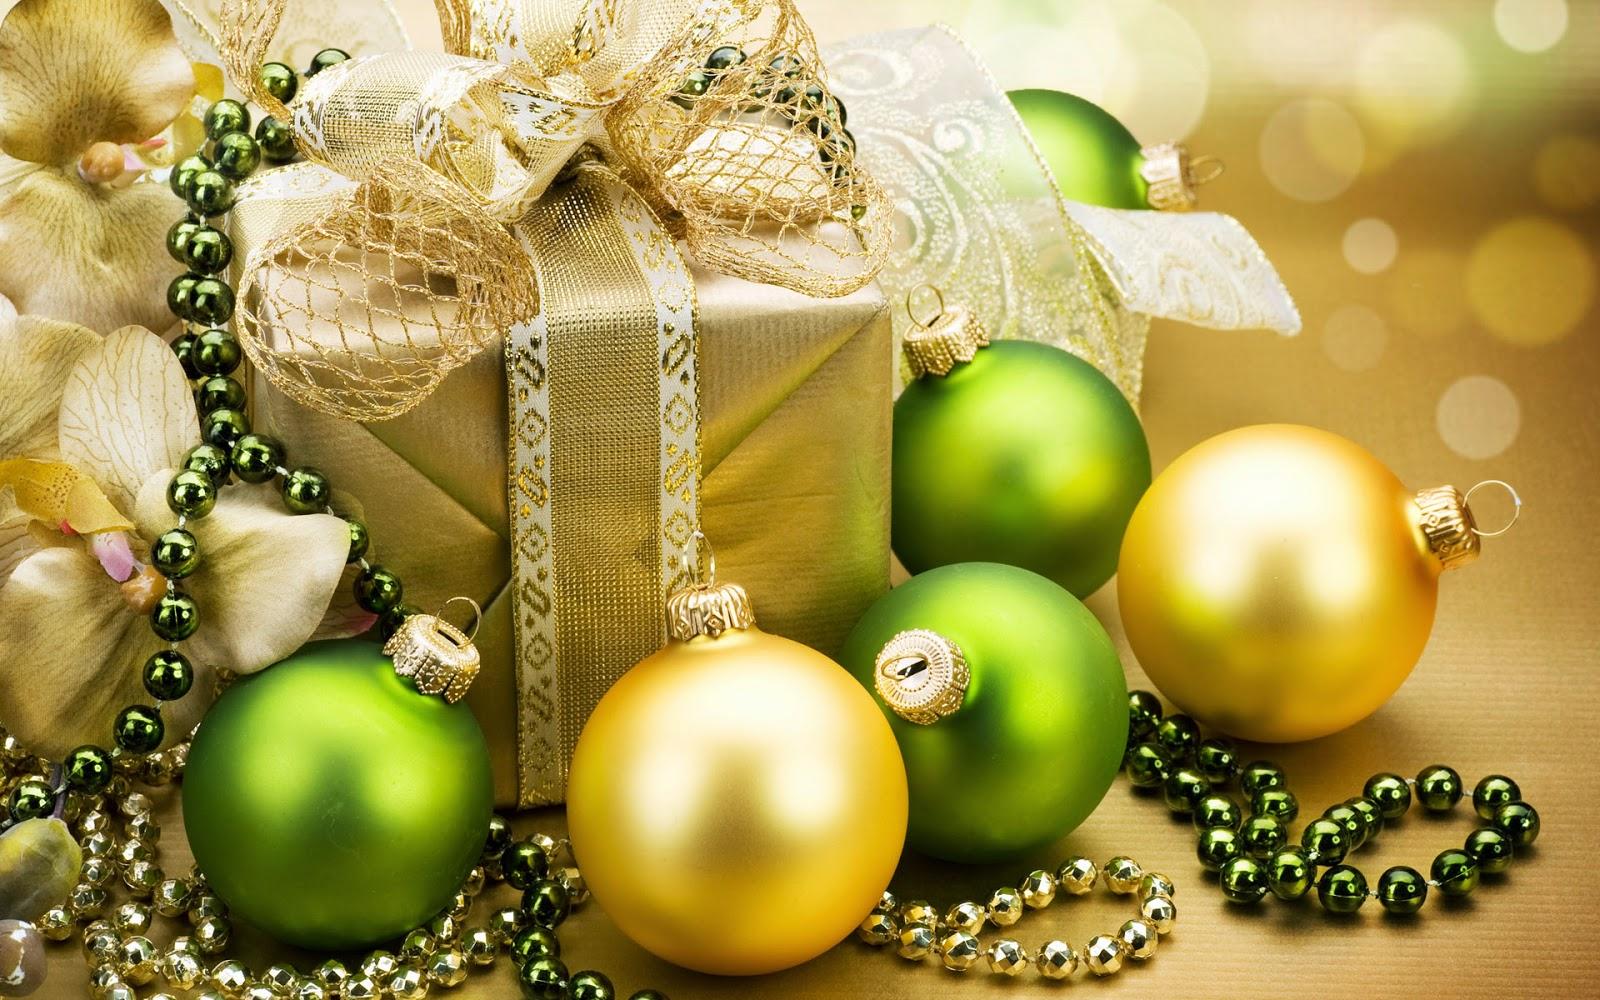 Golden-Christmas-balls-with-green-baubles-gift-box-pack-background-HD-wallpaper.jpg